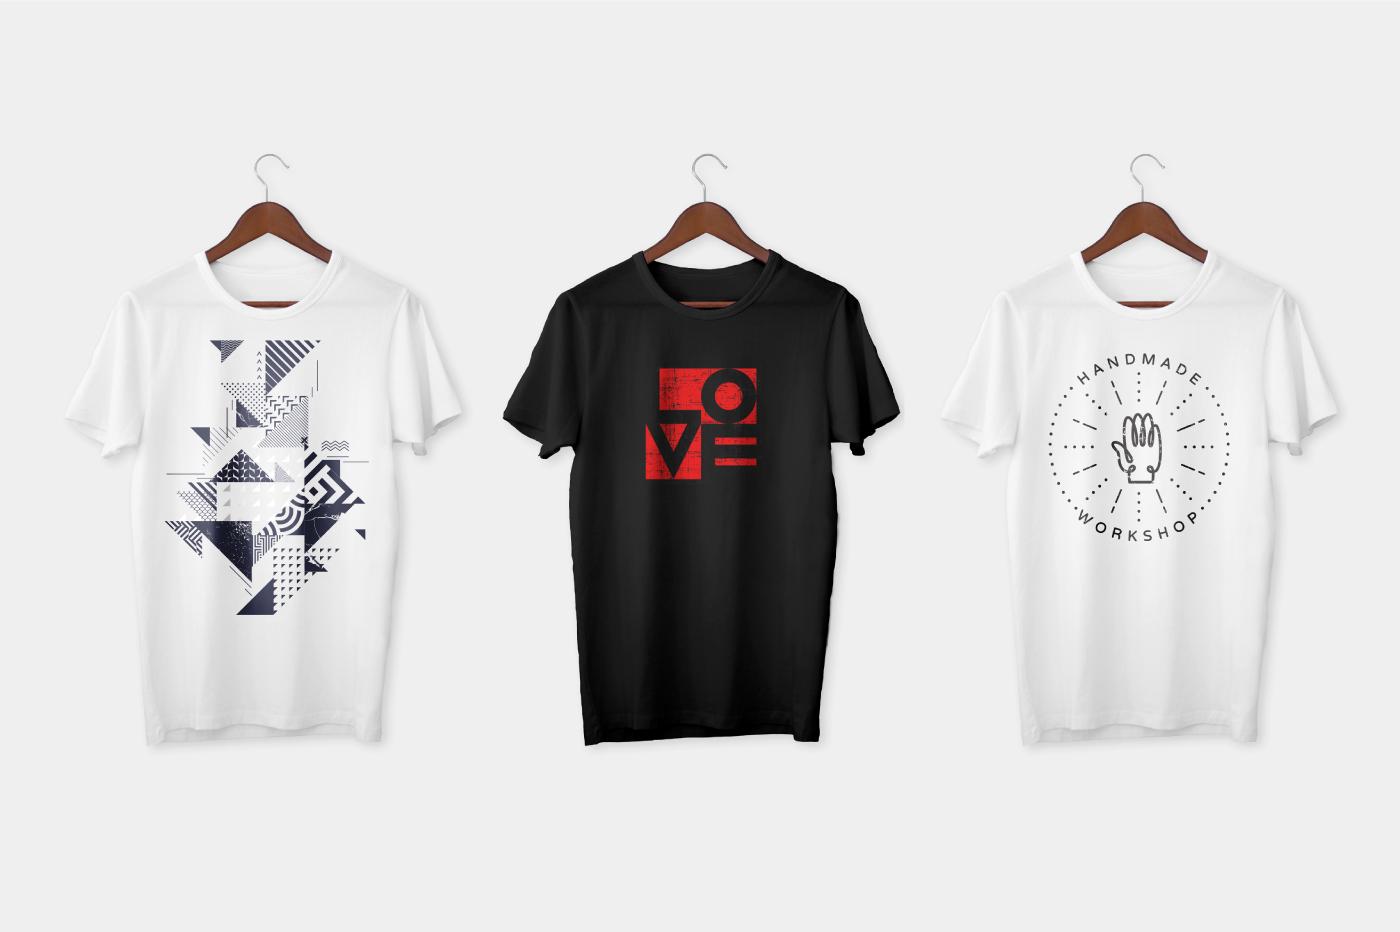 free t-shirt tshirt shirt White photoshop psd Mockup mockups black